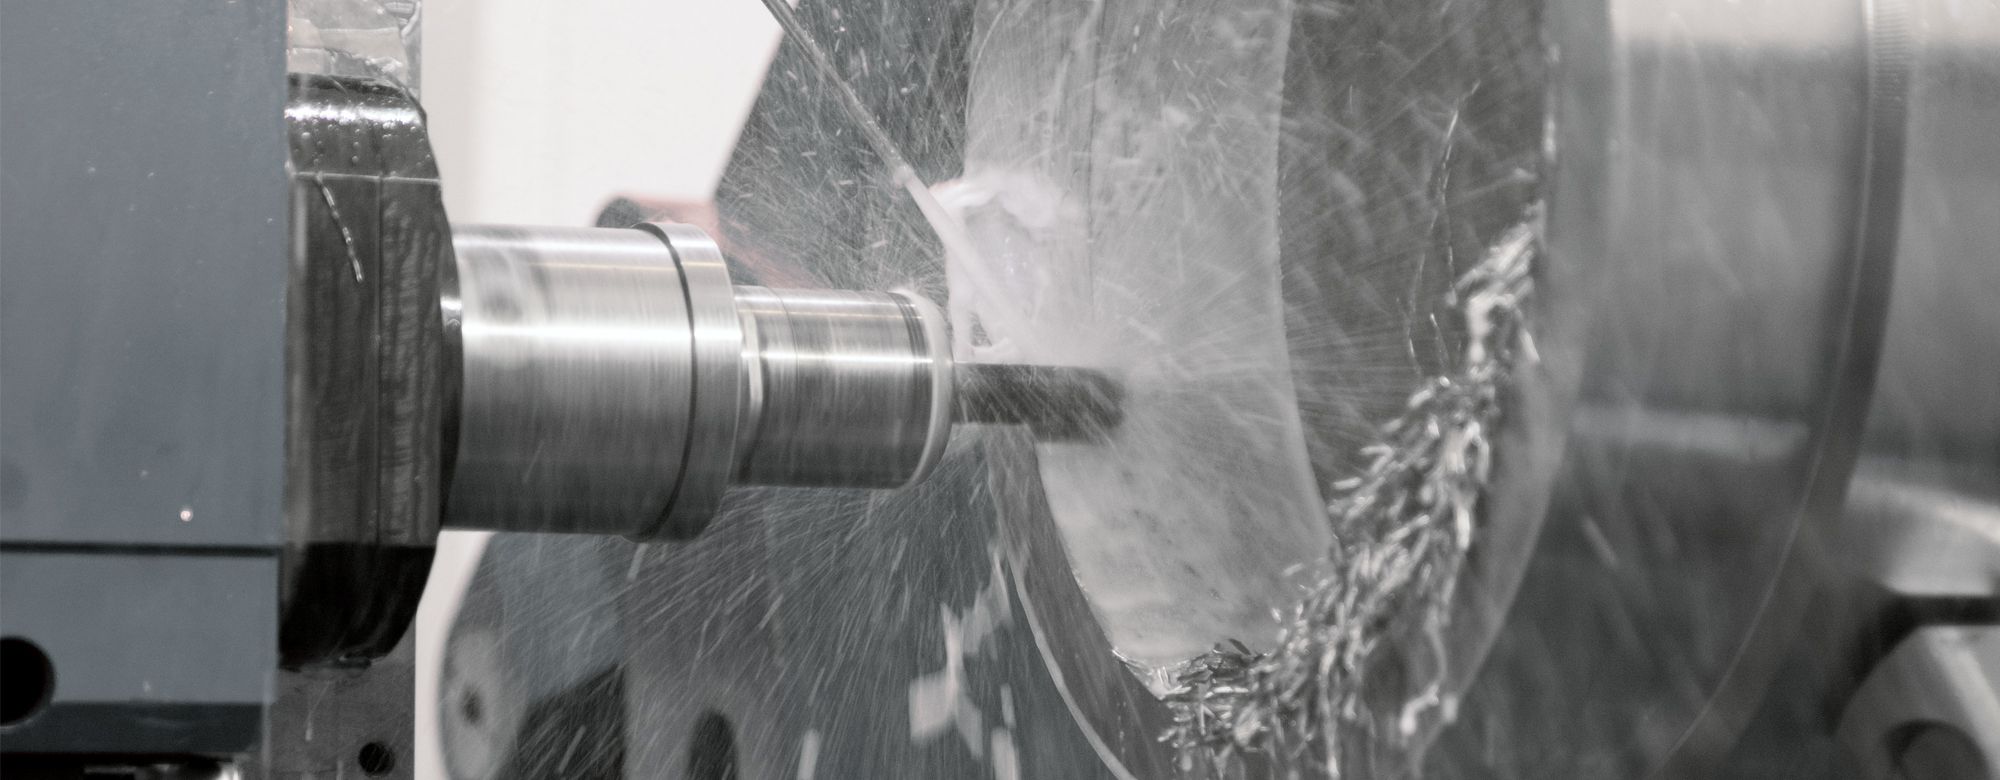 cooling-system-accessorys-lathe-gurutzpe-slider